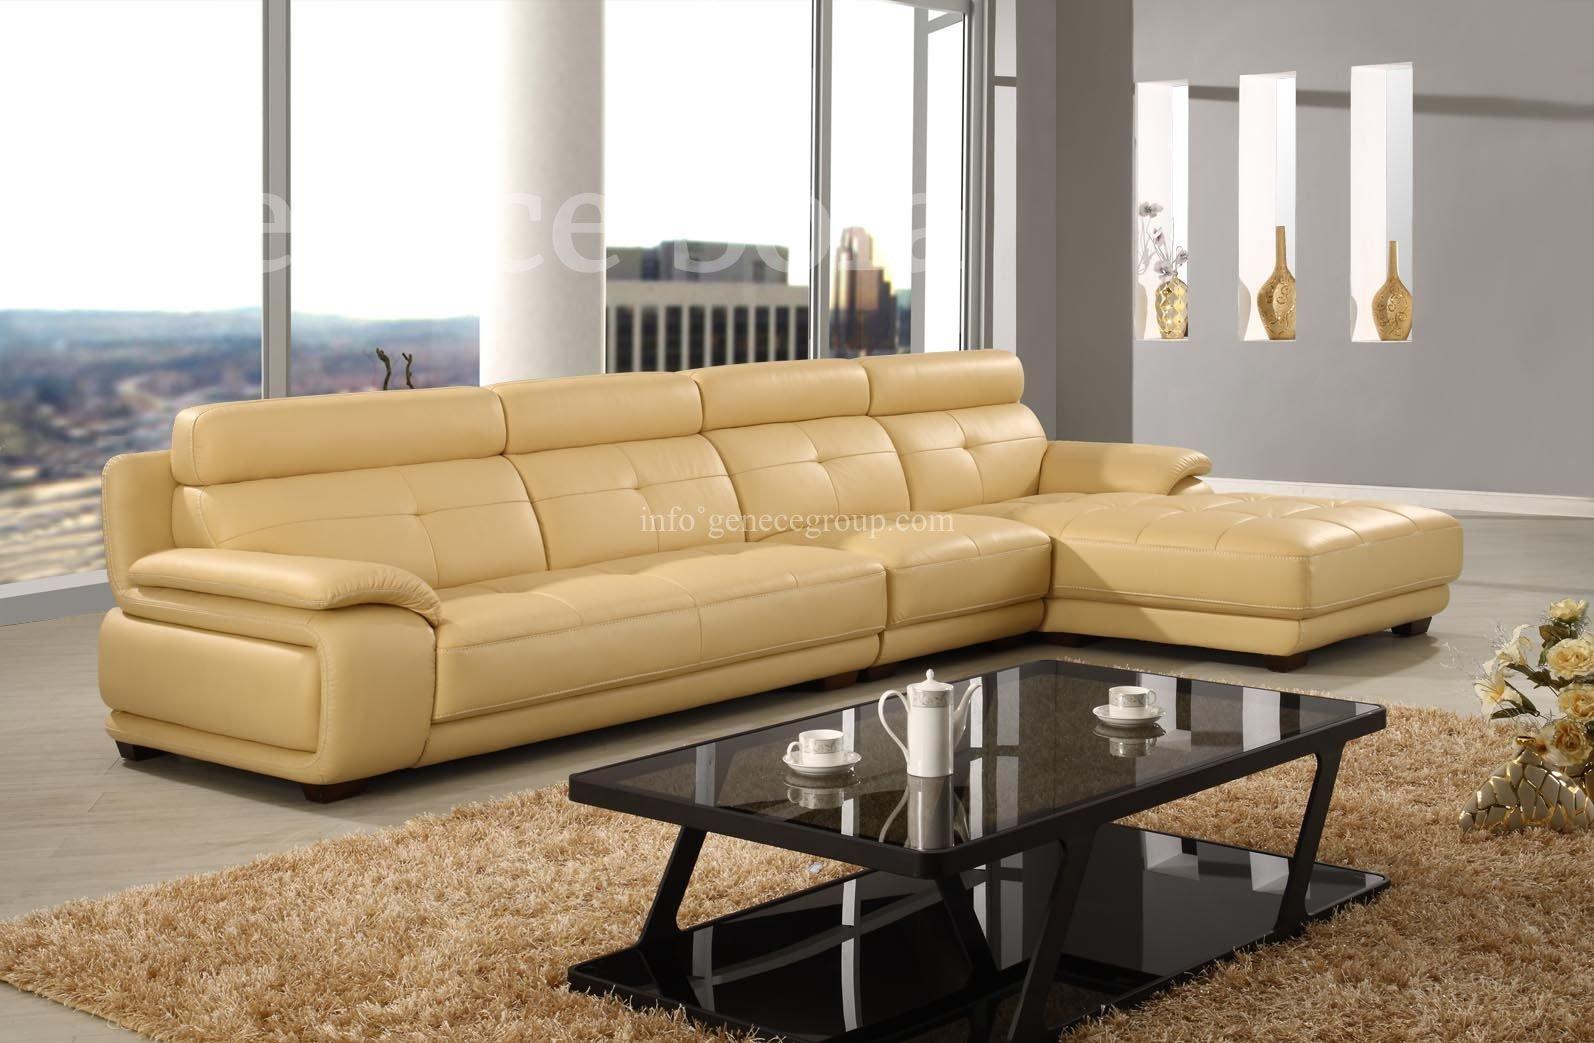 Top Grain Leather Sofa | 1594 x 1043 · 205 kB · jpeg